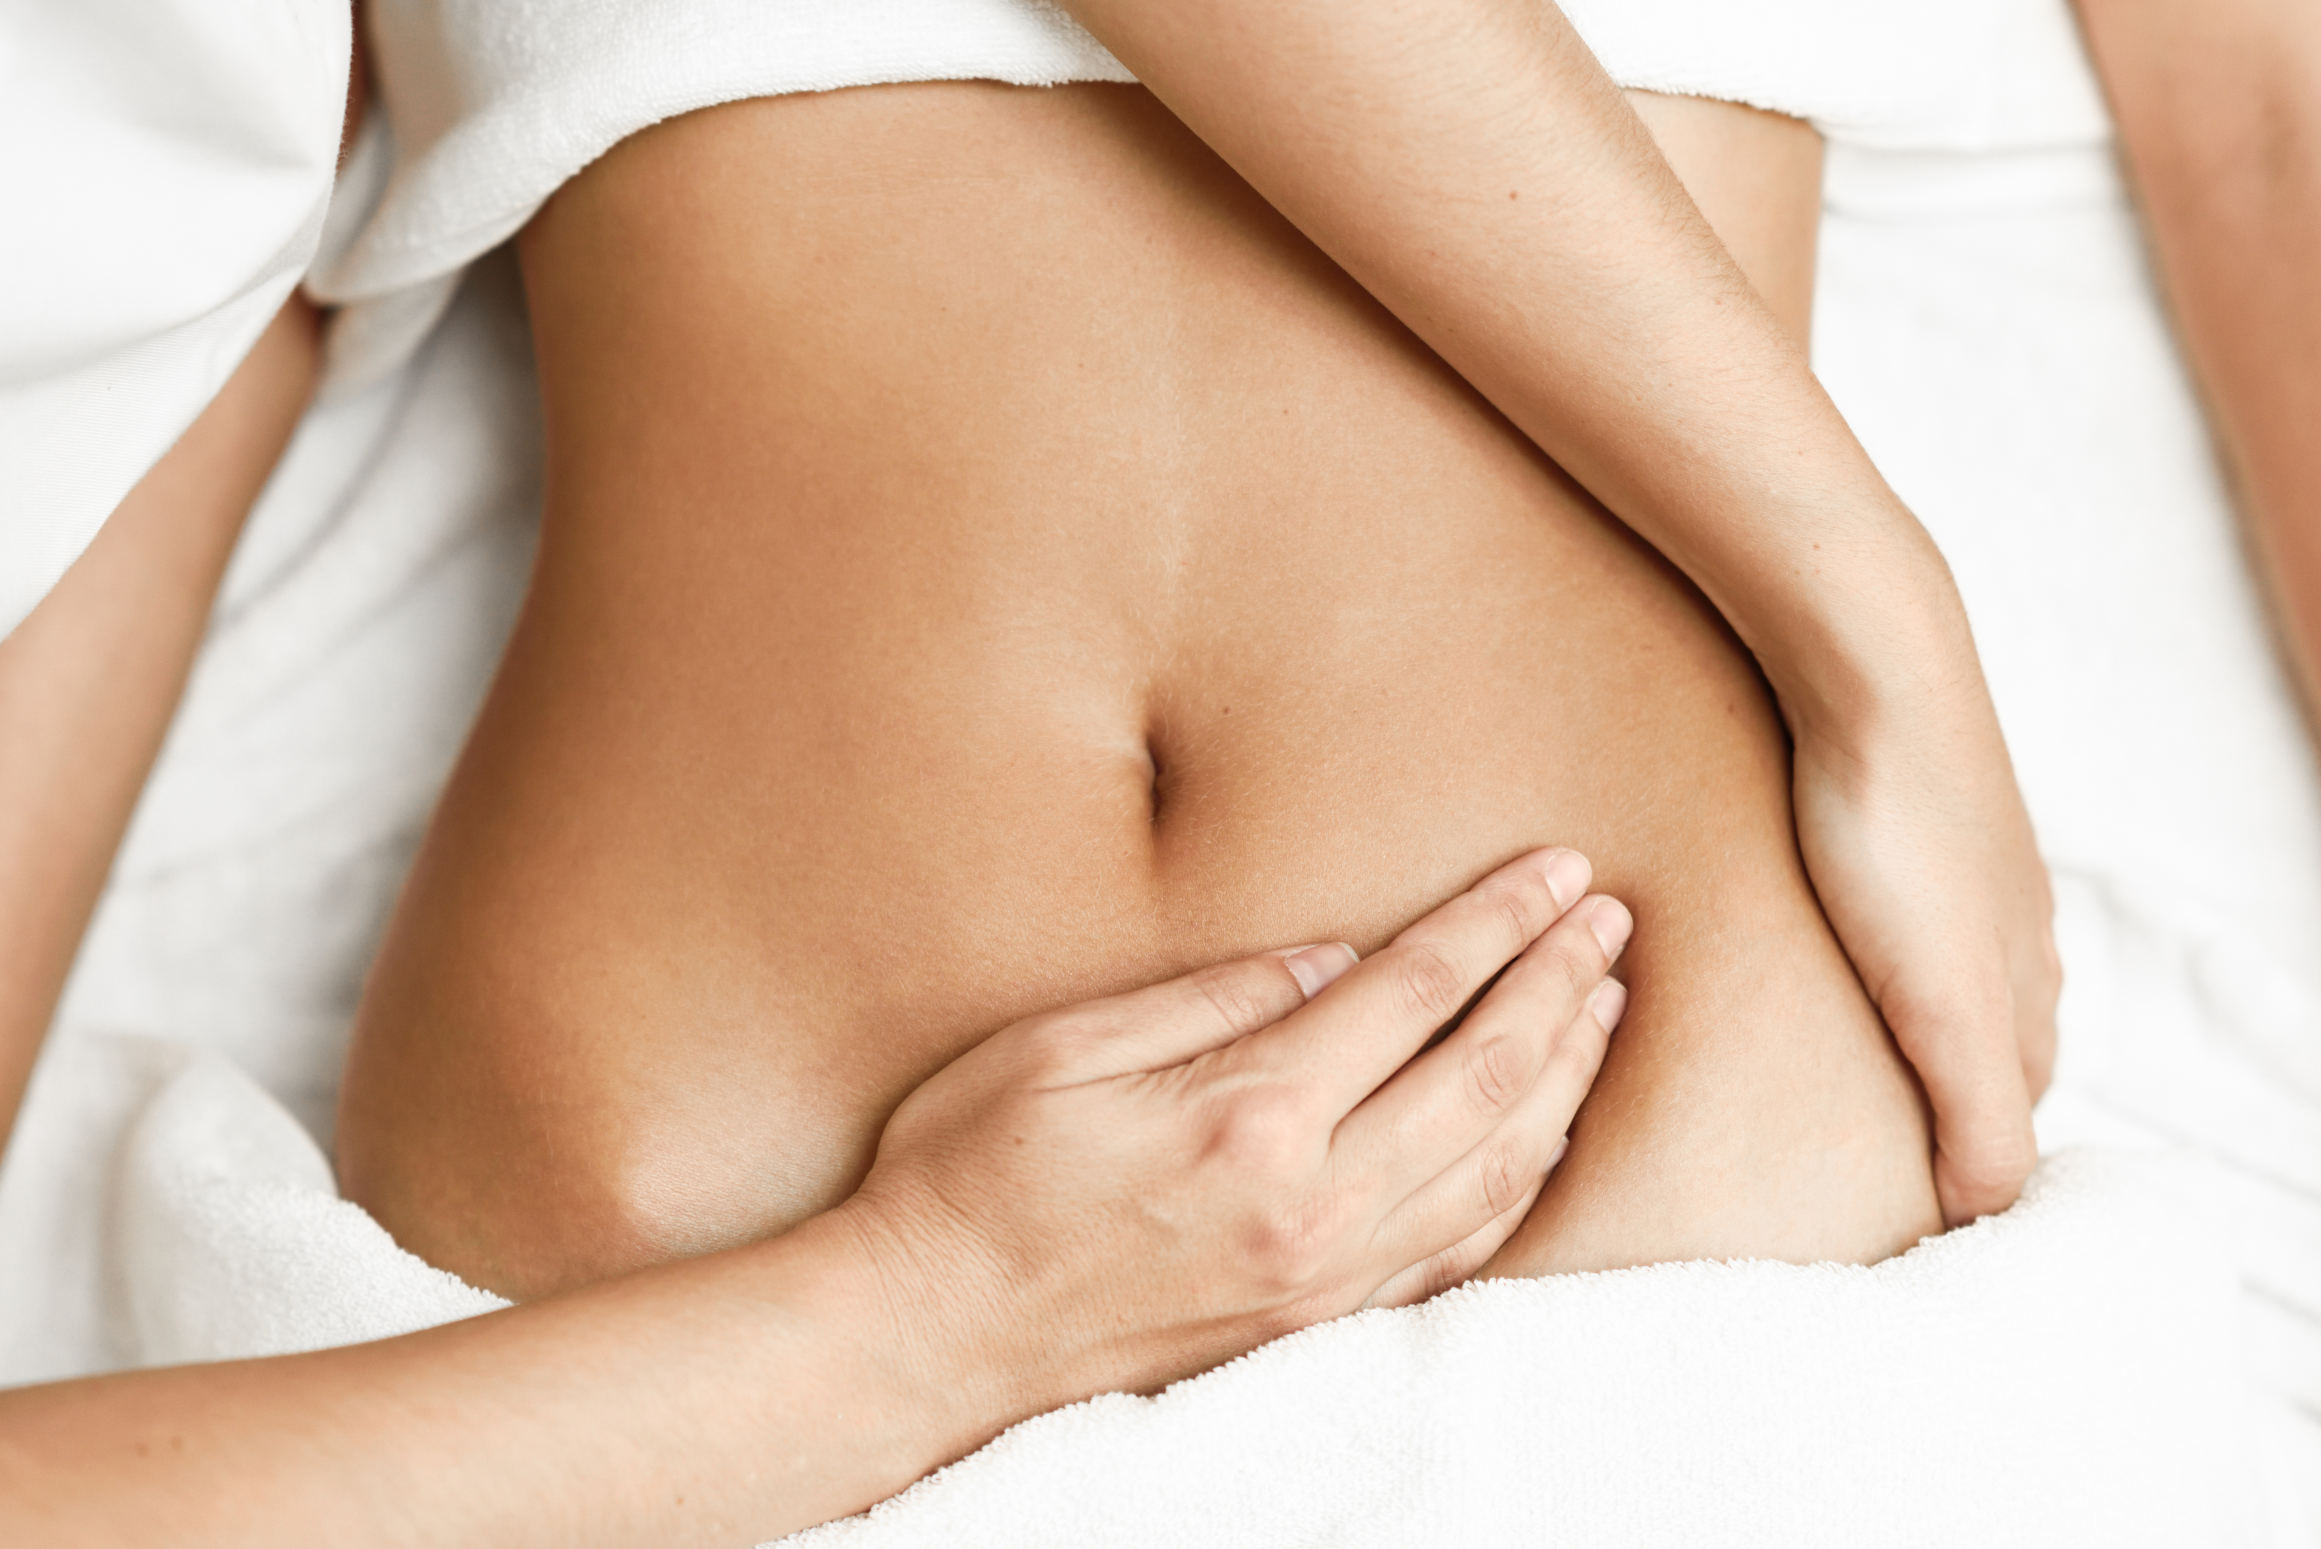 Hands treating female abdomen.Therapist applying pressure on belly.